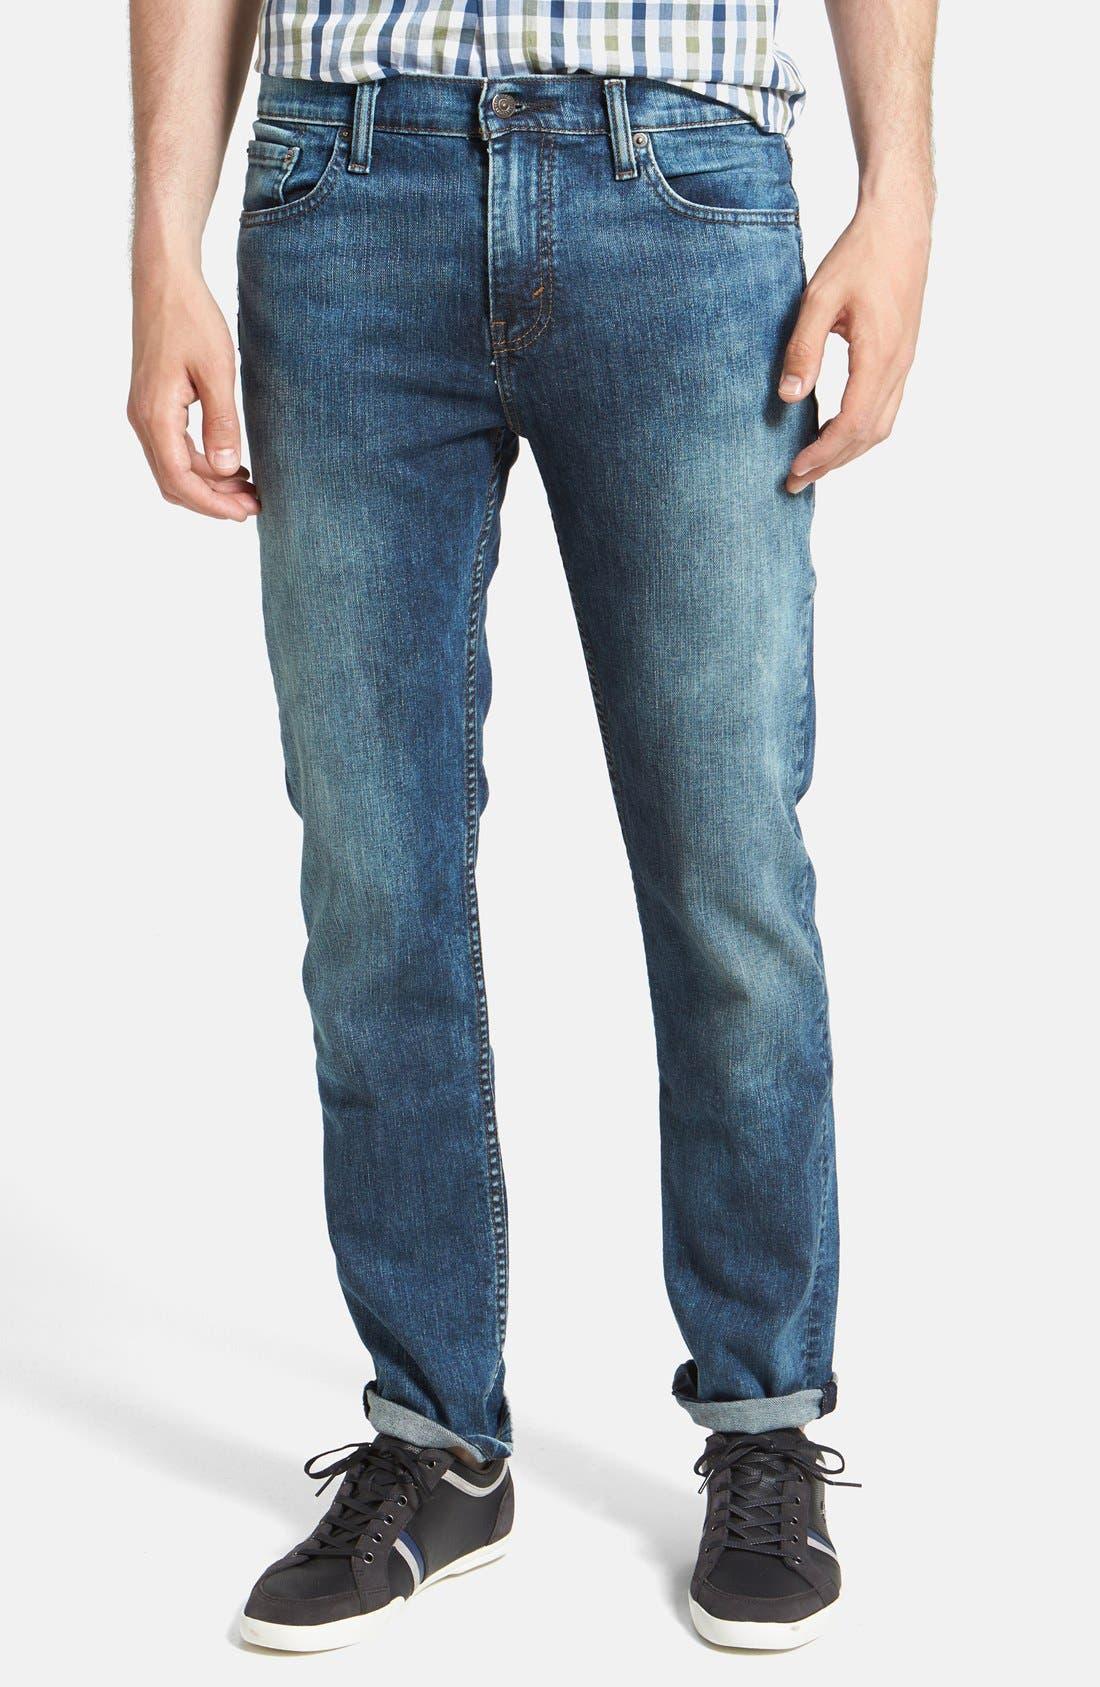 Alternate Image 1 Selected - Levi's® '511™' Slim Fit Jeans (Blue Foam)